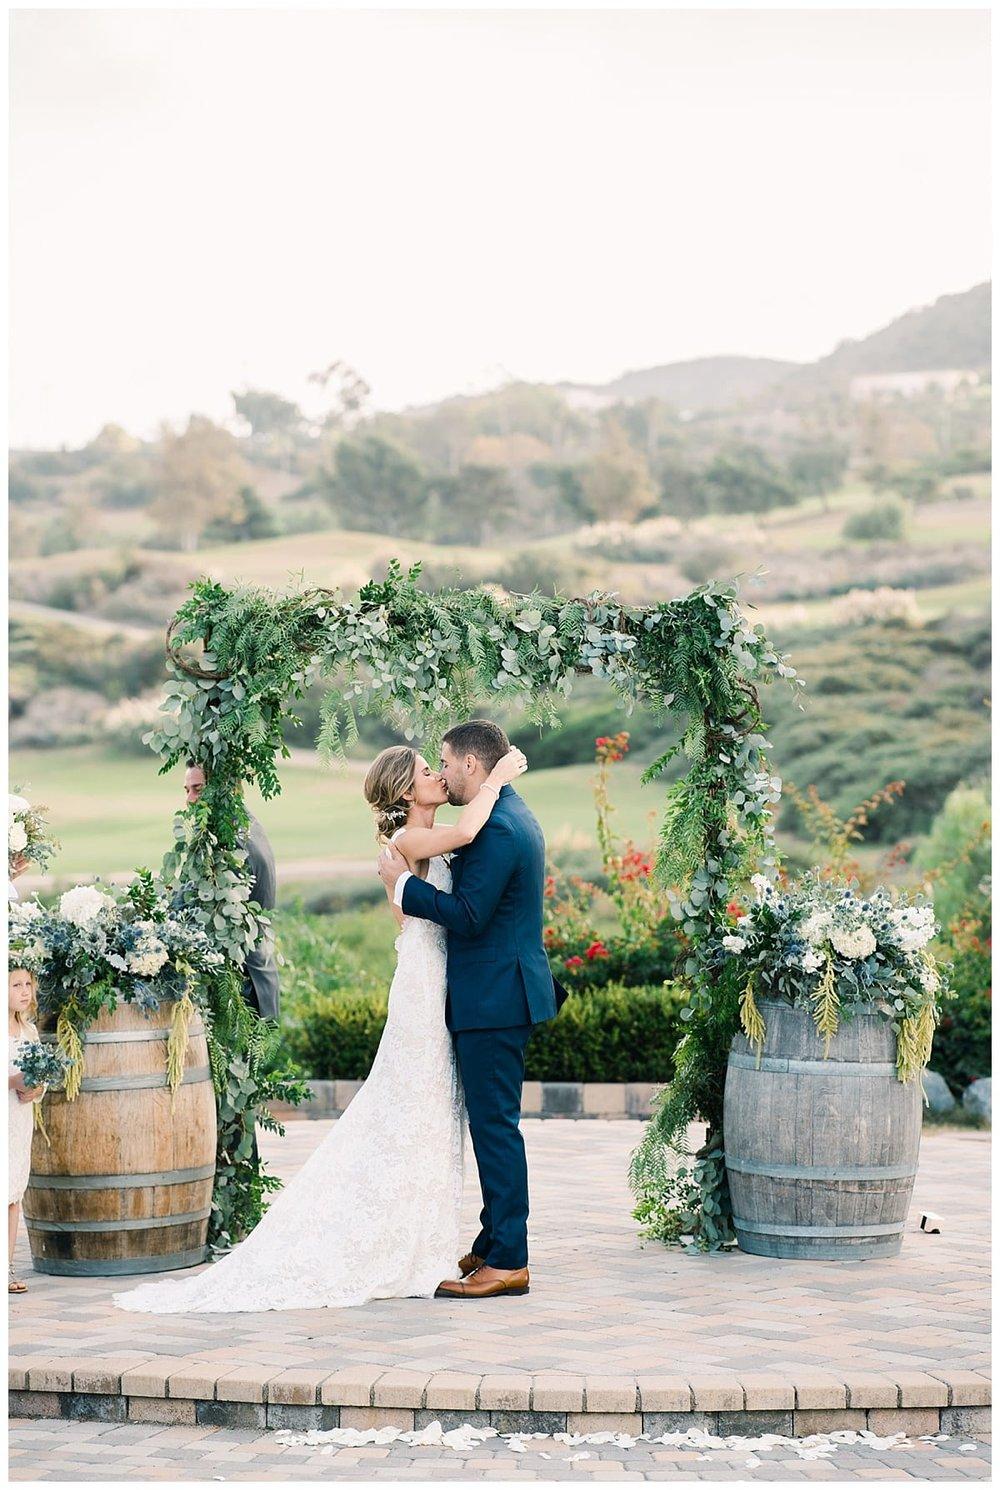 Bella-Collina-San-Clemente-Wedding-Carissa-Woo-Photography_0049.jpg